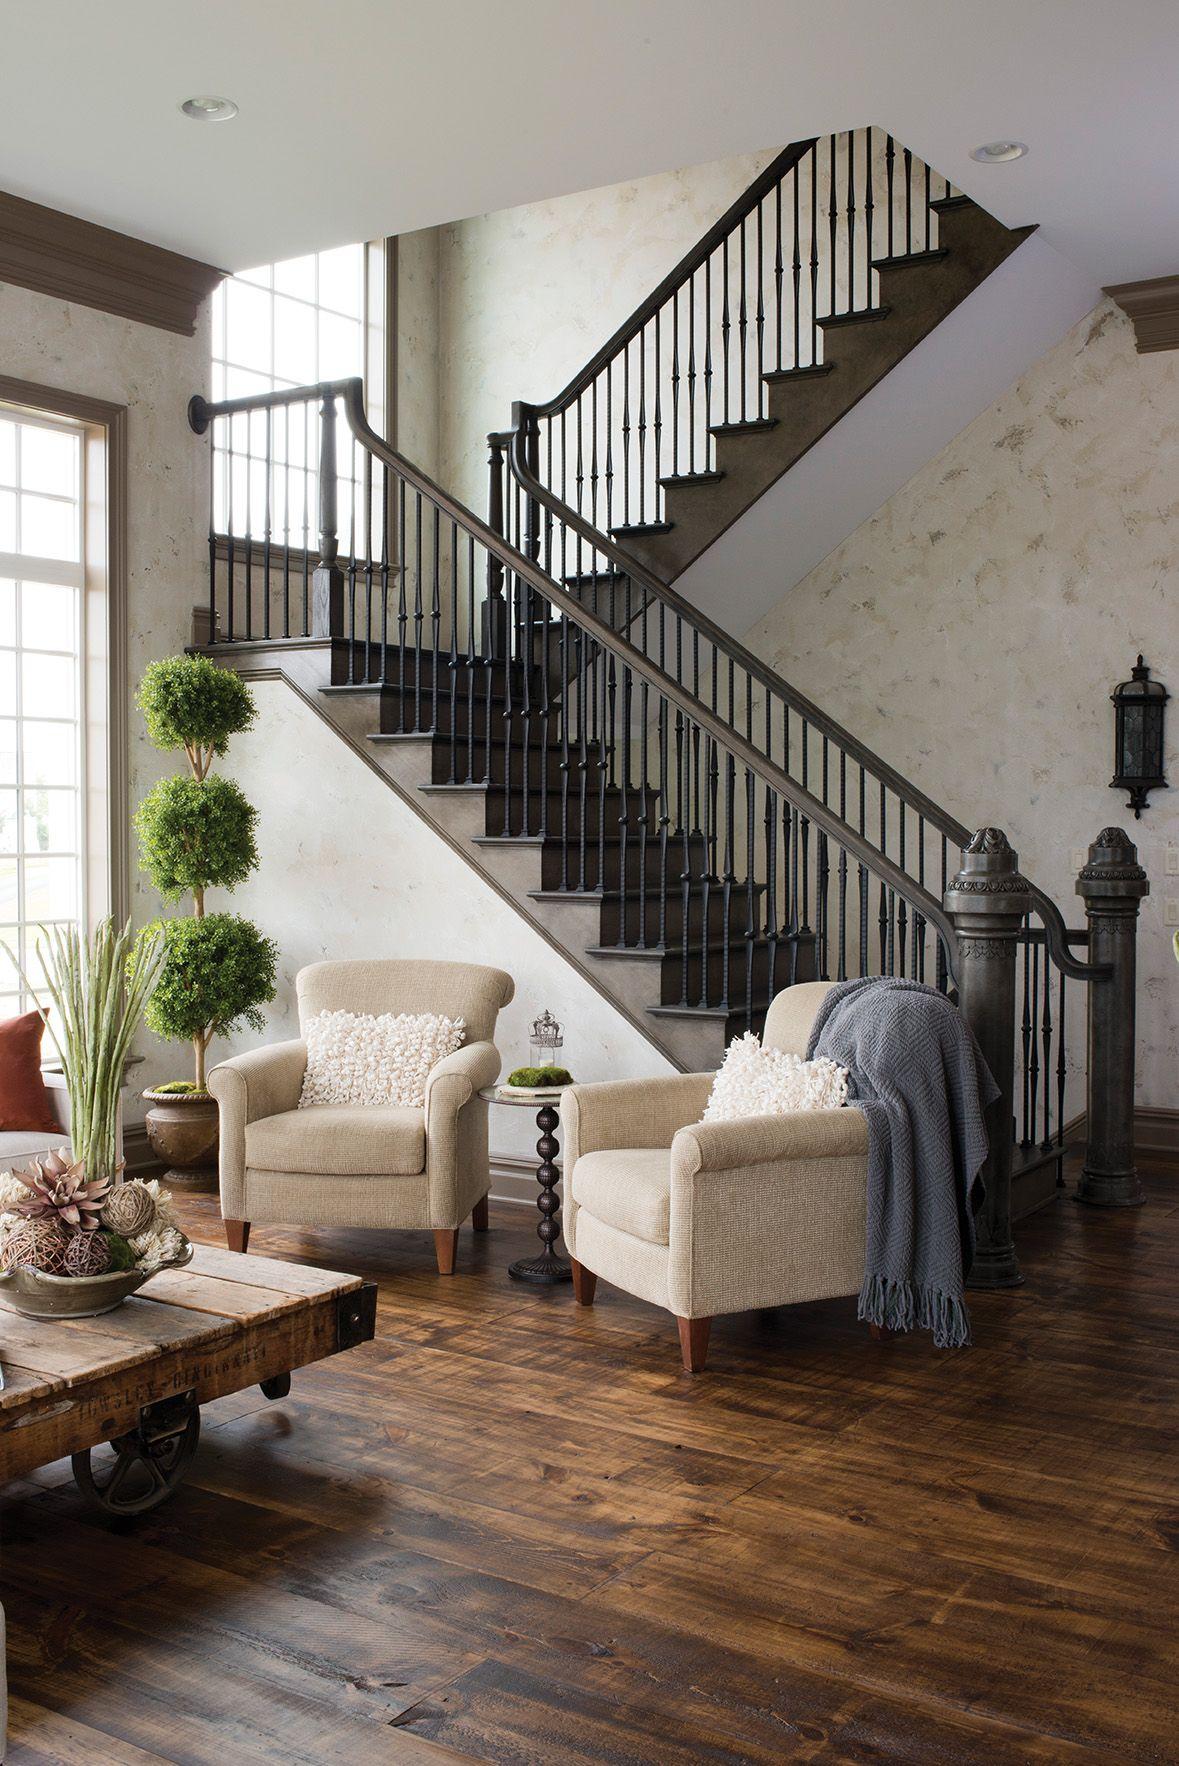 Home interior railings rustic u refined lancaster county home  interior design  pinterest